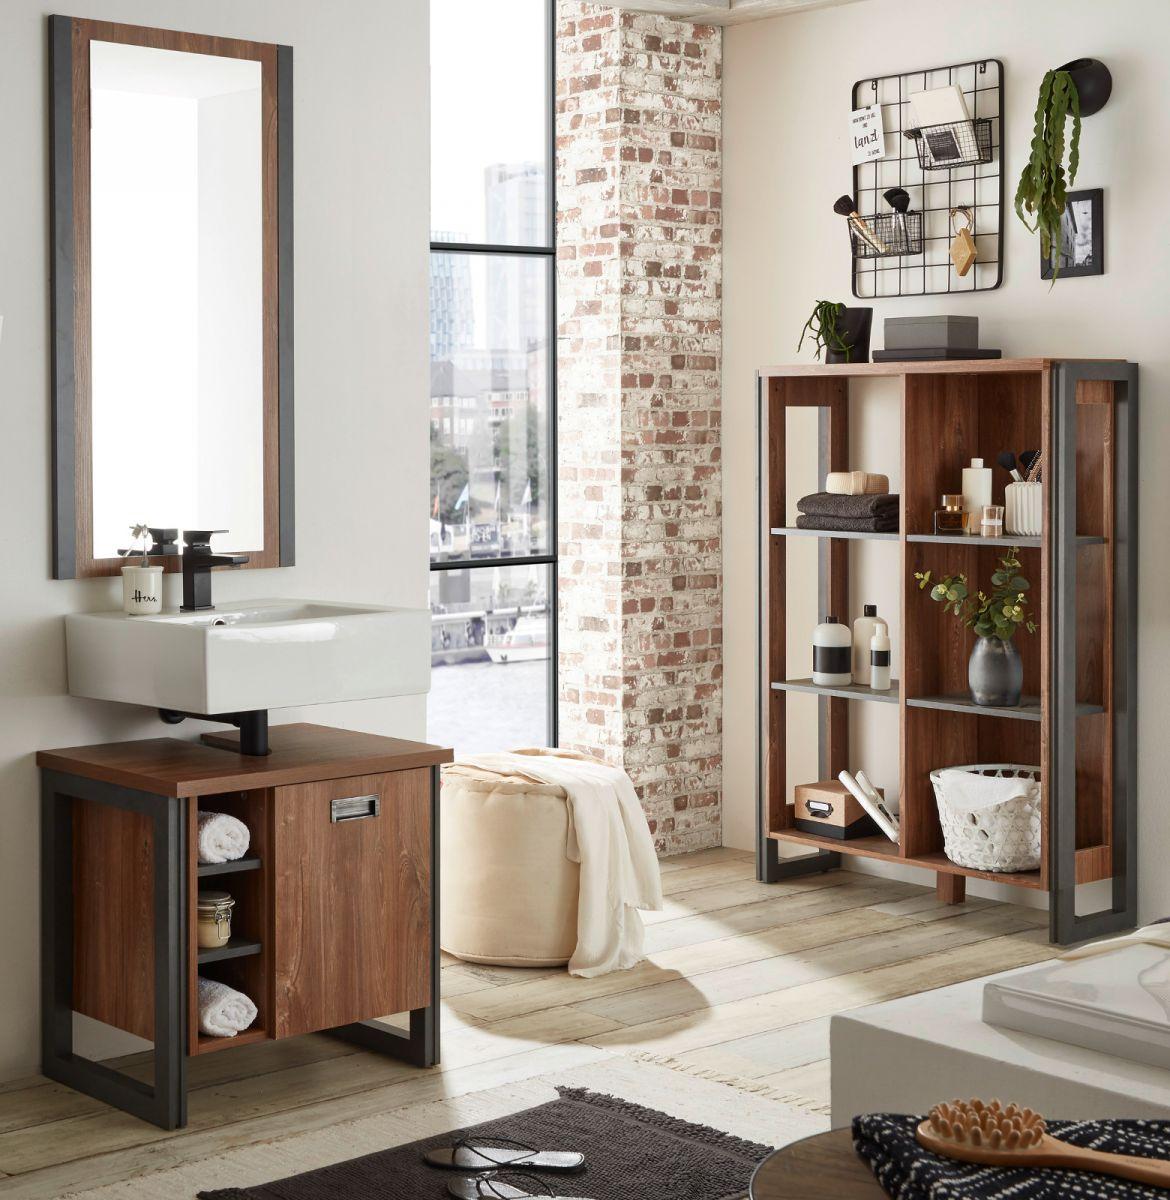 Badmöbel Set 3-teilig Auburn Eiche Stirling und Matera grau 171 x 205 cm